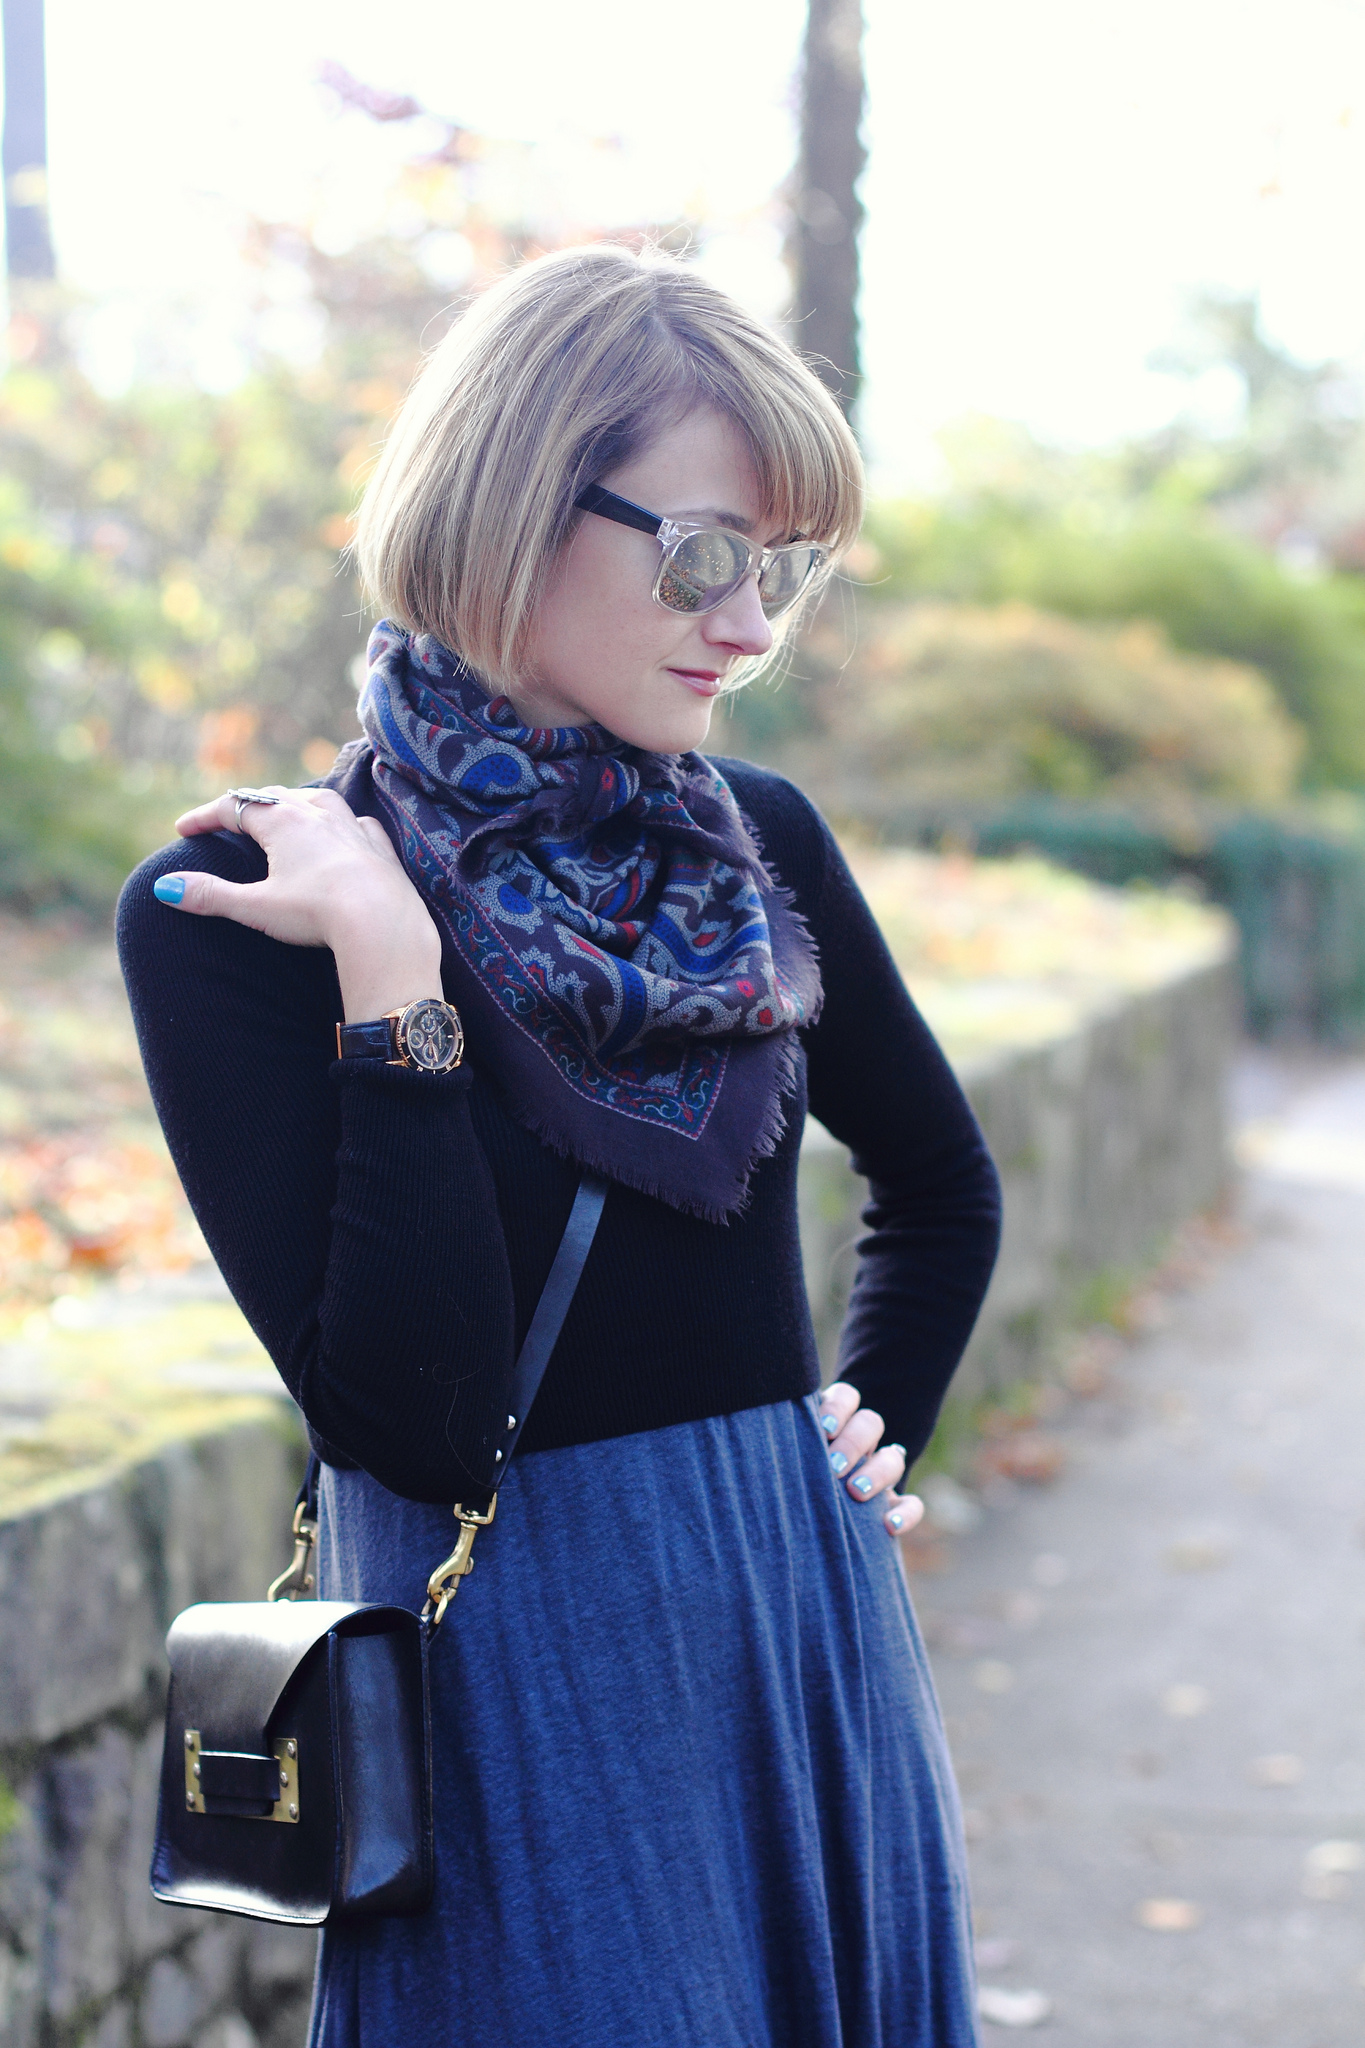 Maxi dress + cropped sweater